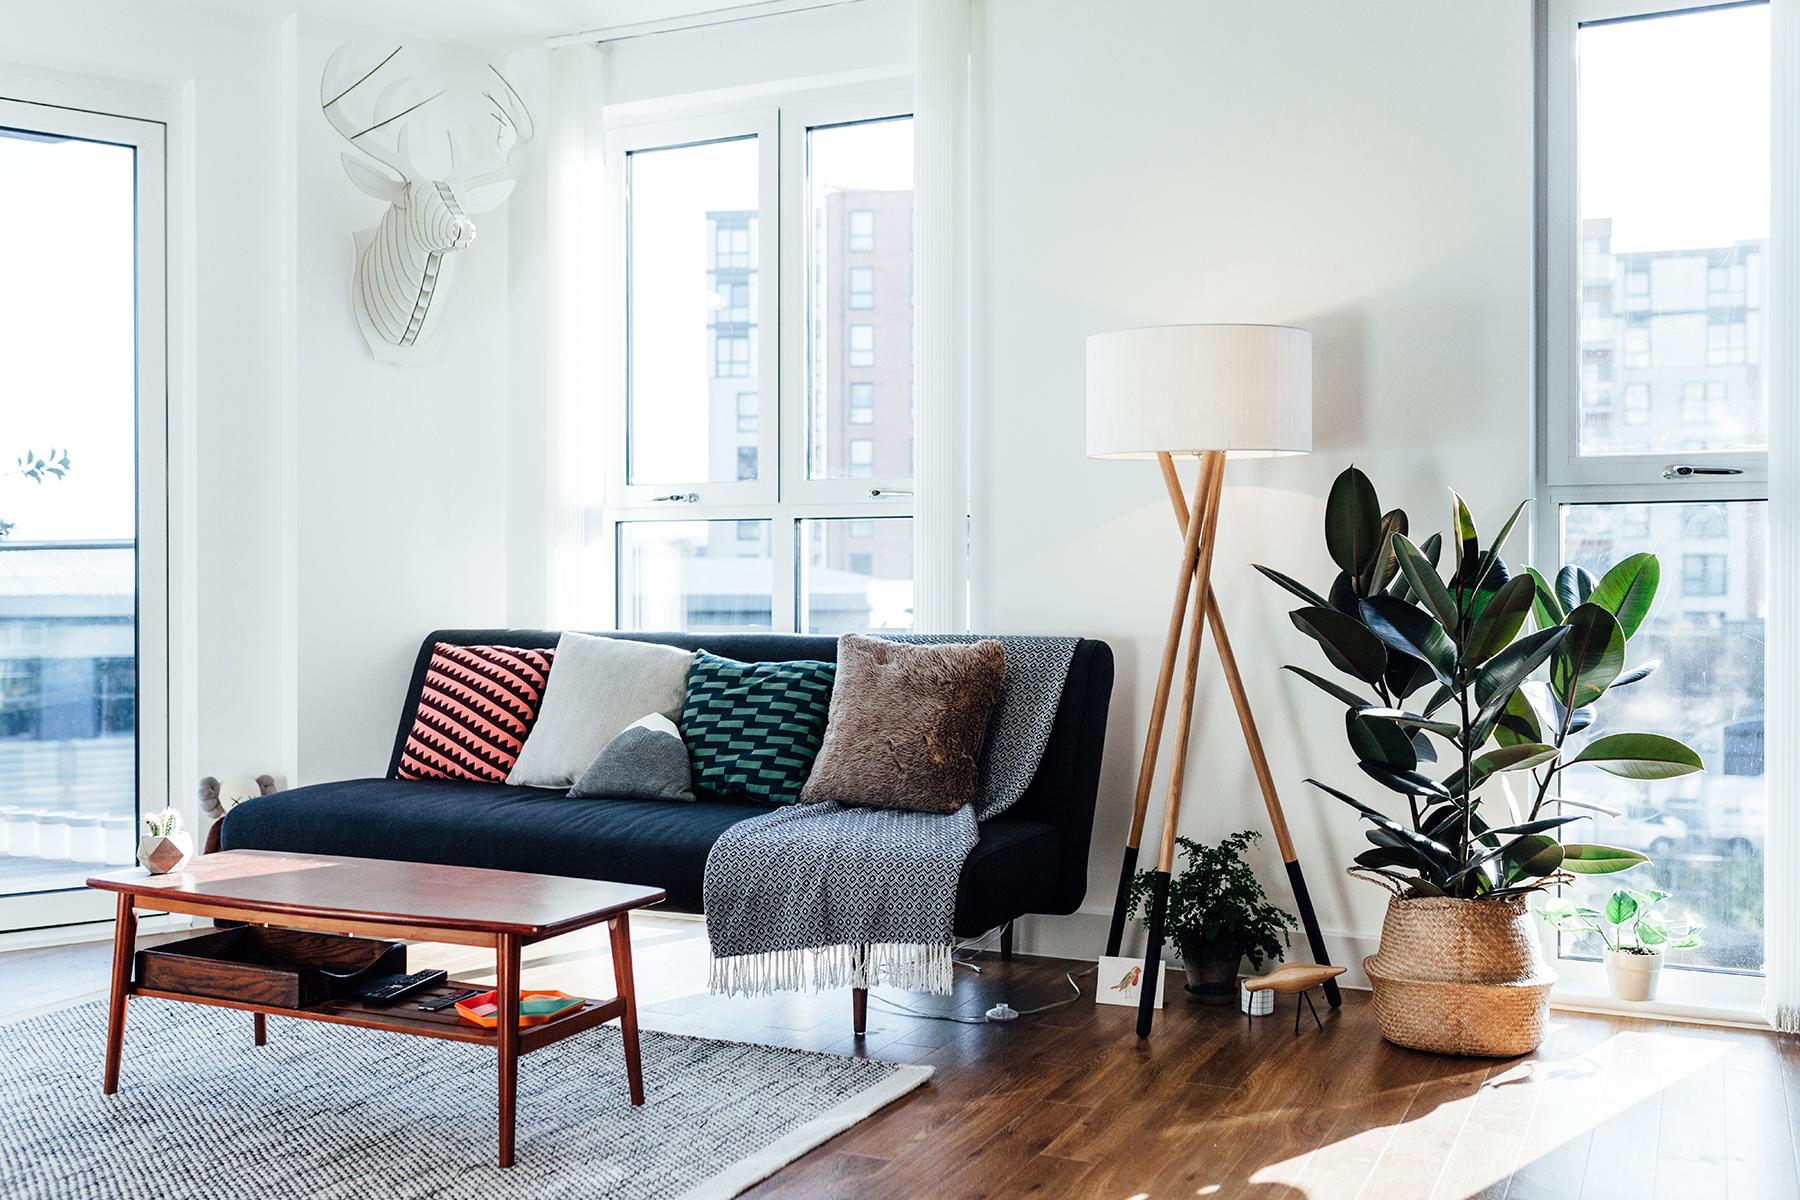 Connect shoe light ideas for simple home decor